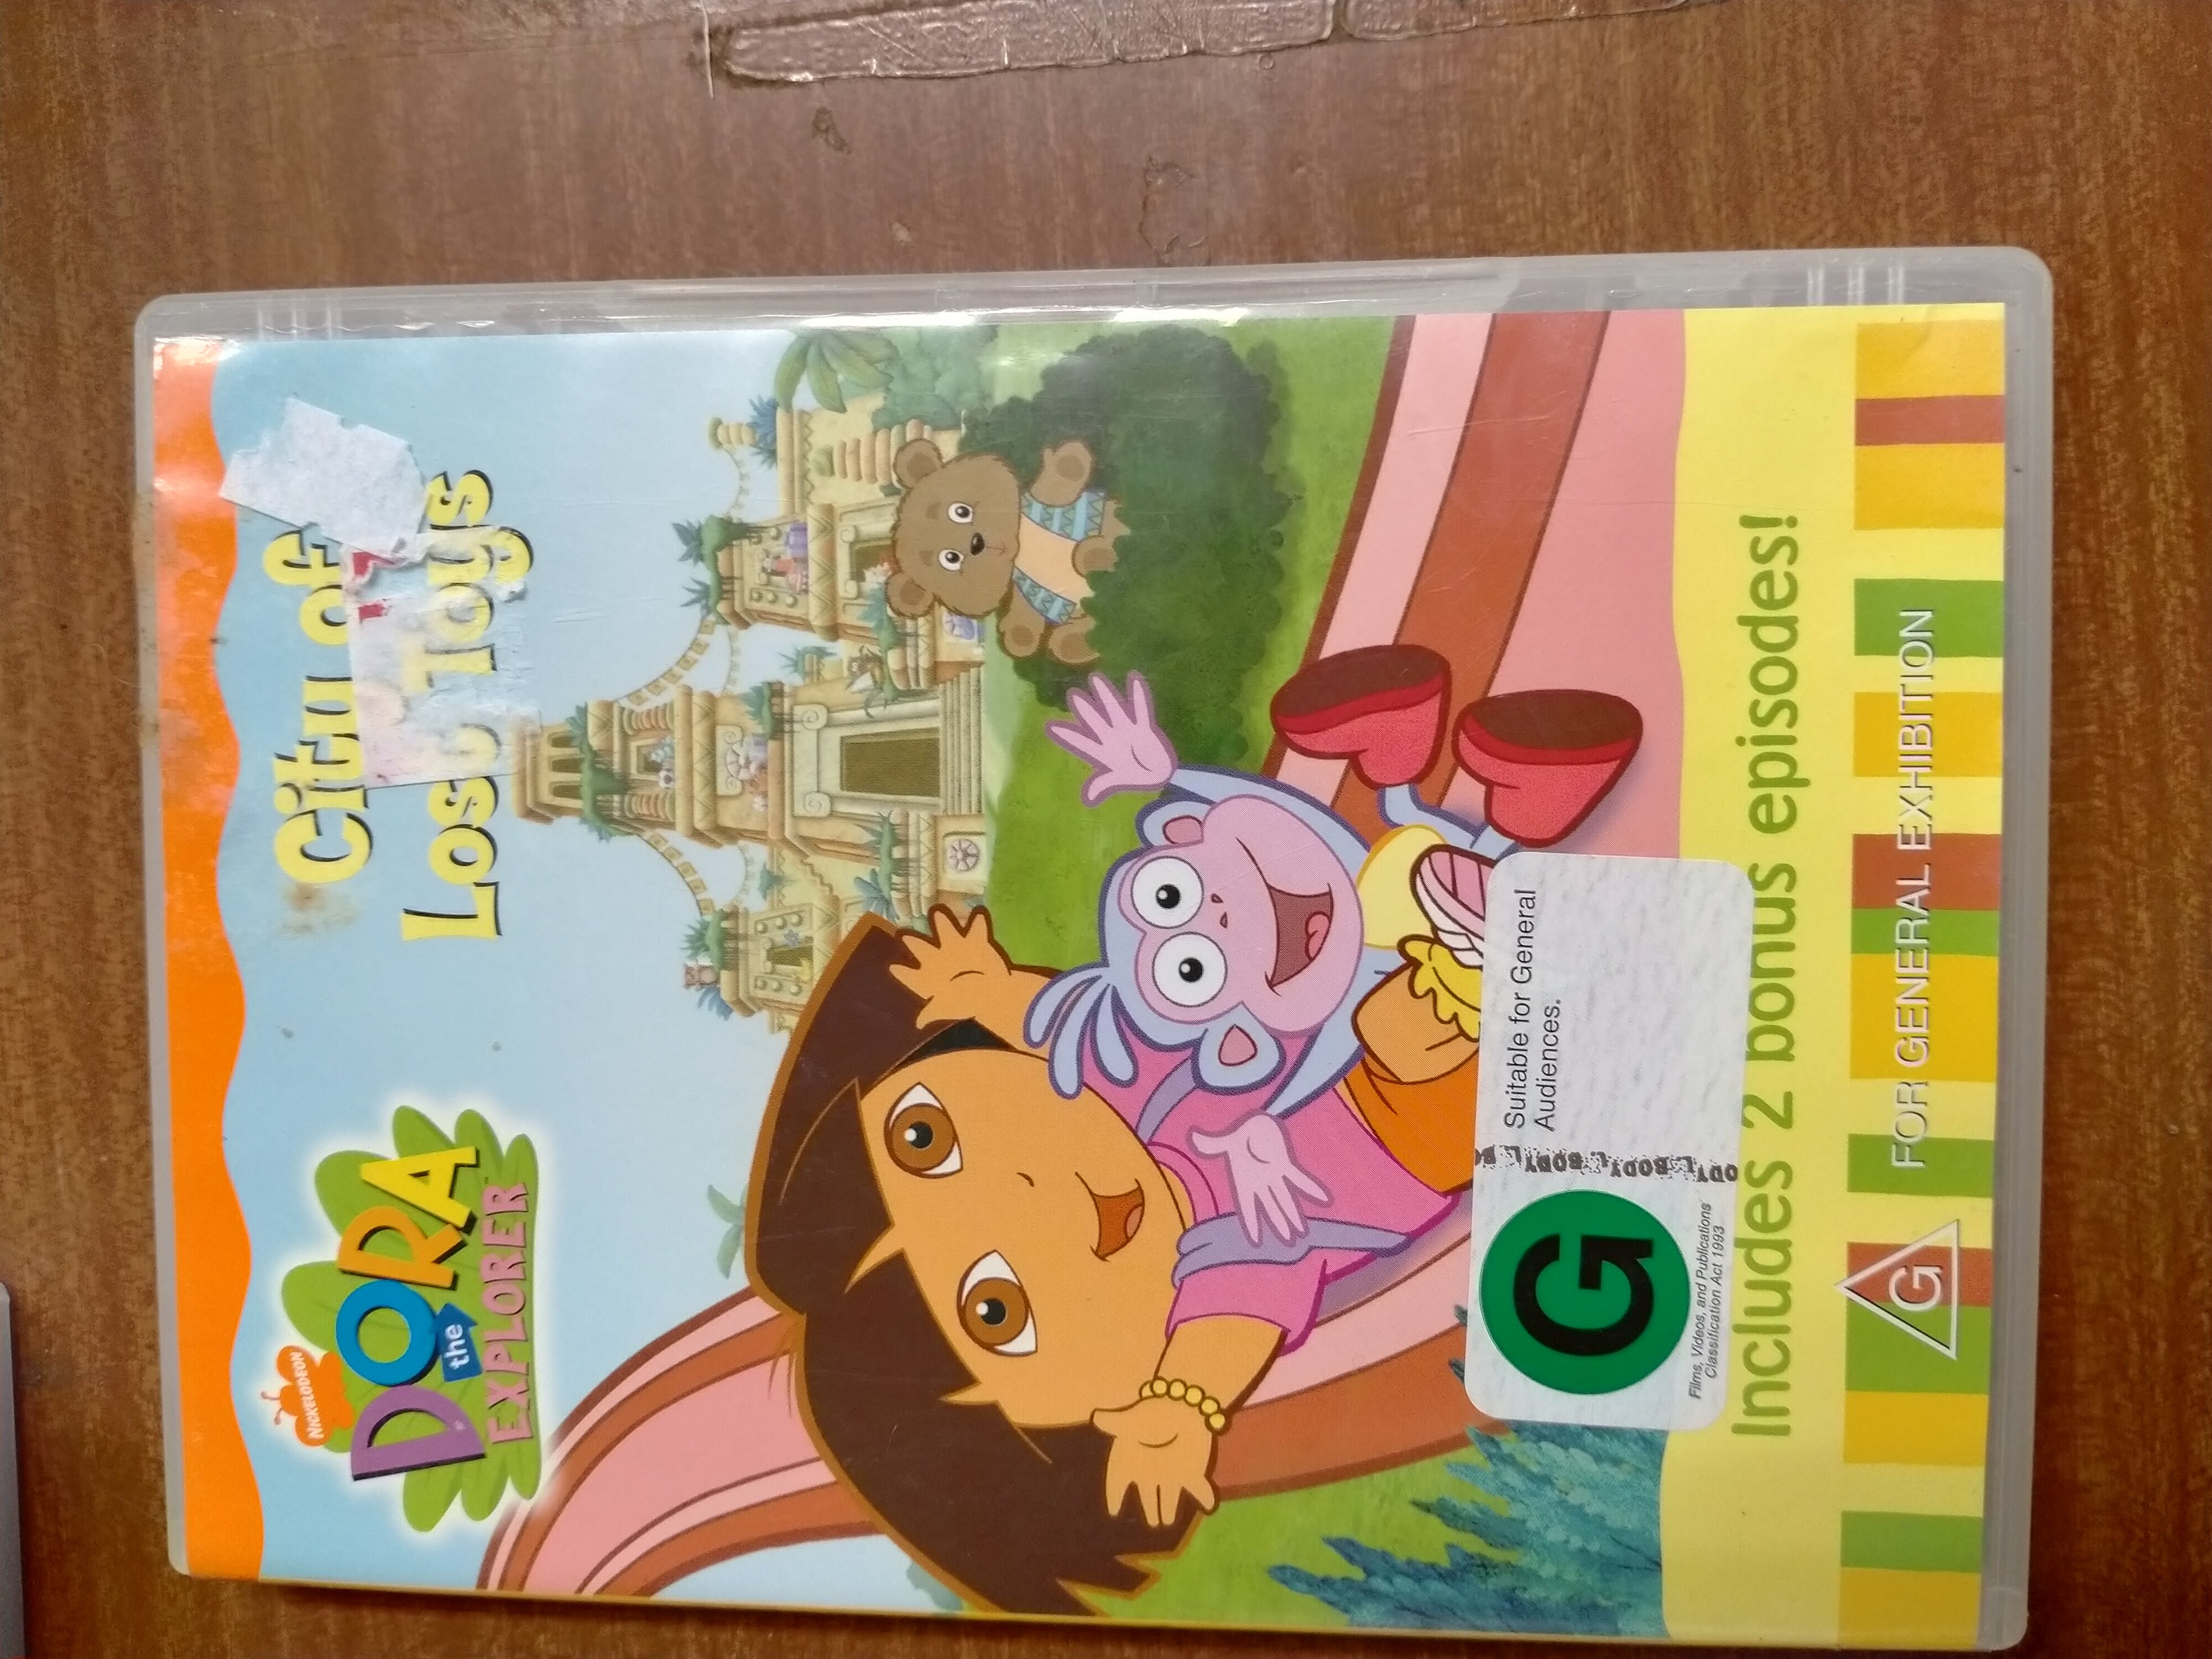 Dora the Explorer - City of Lost Toys DVD photo